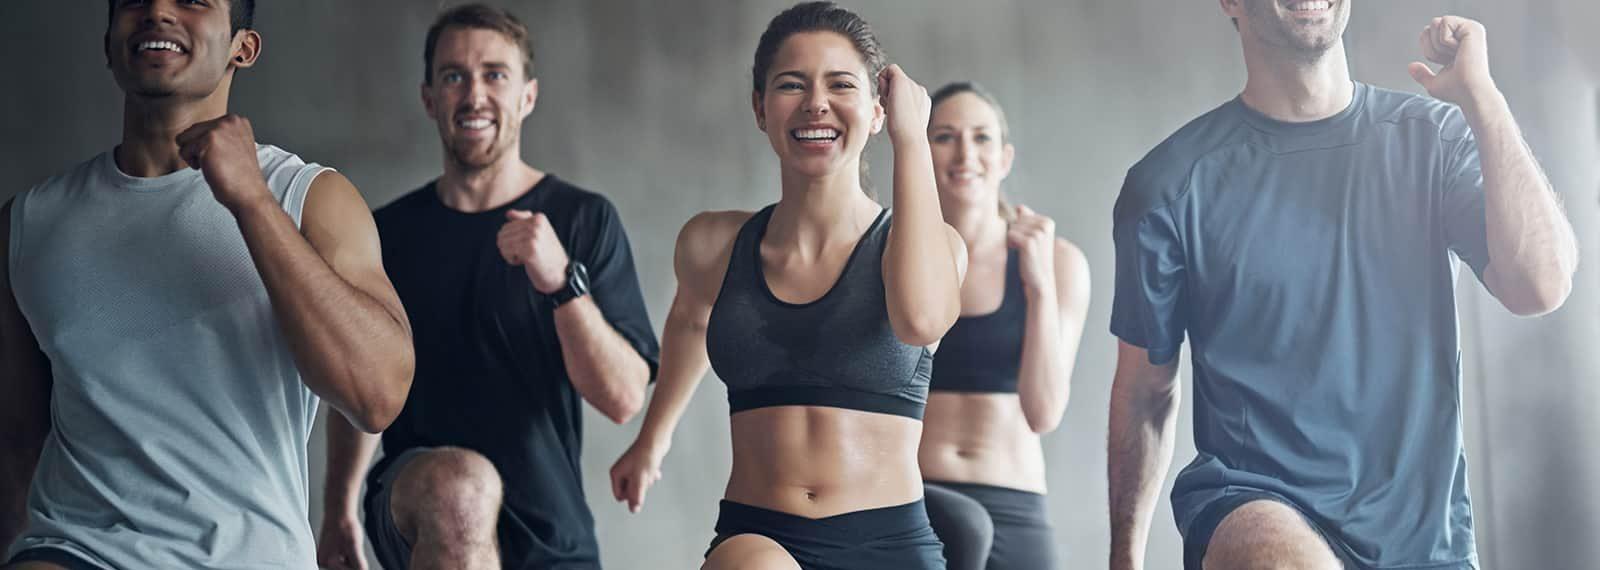 Gemeinsam trainieren im Fitness-Loft Be part of the family!